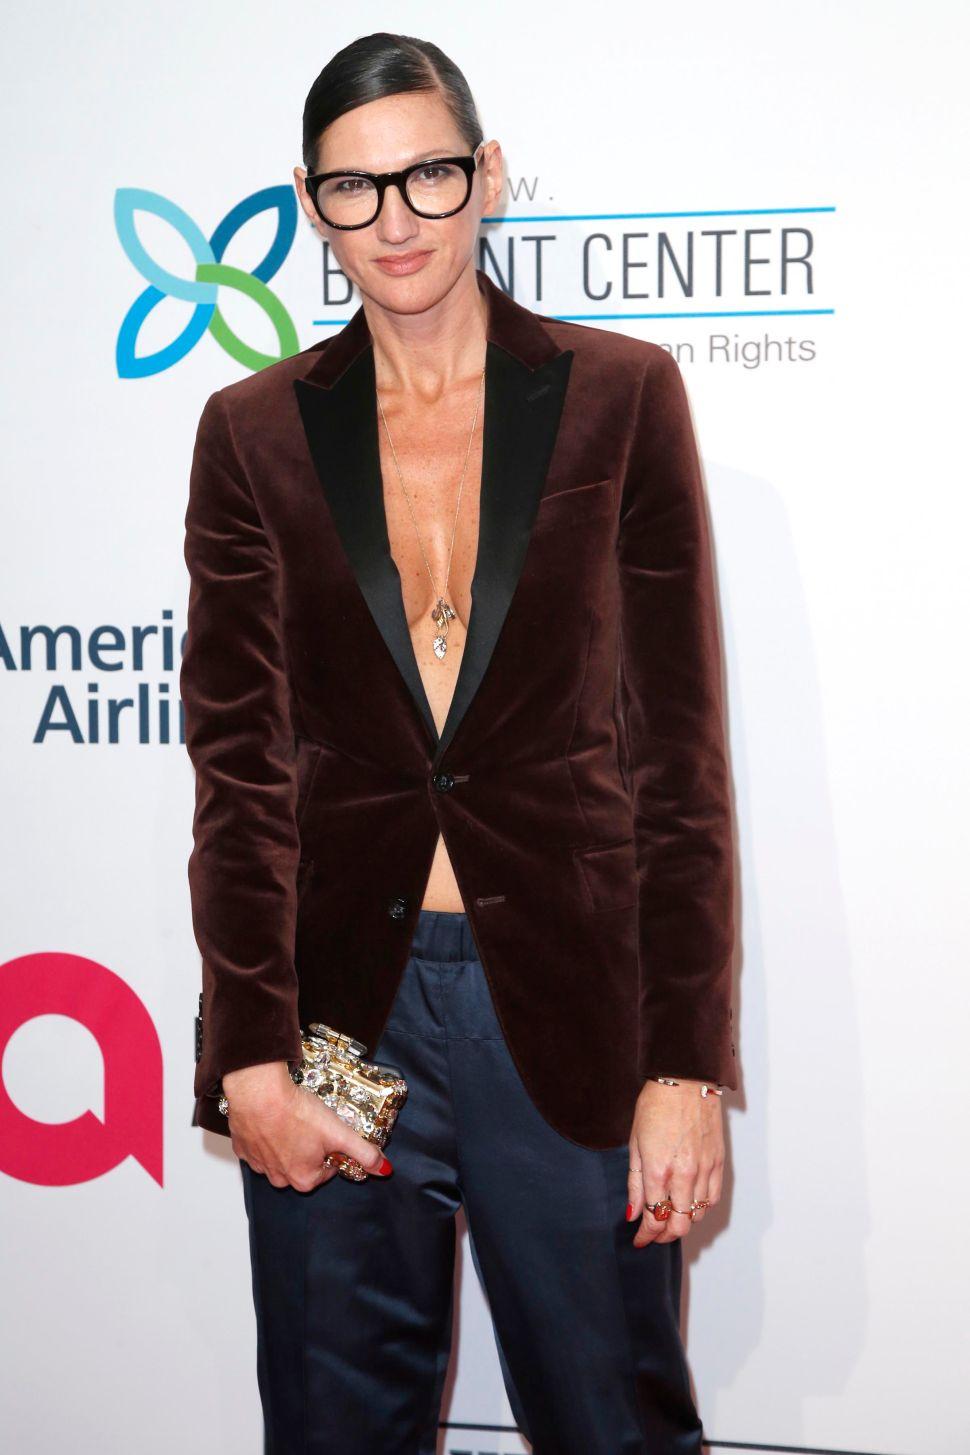 Jenna Lyons Turns a Men's J. Crew Blazer Into Sexy Eveningwear